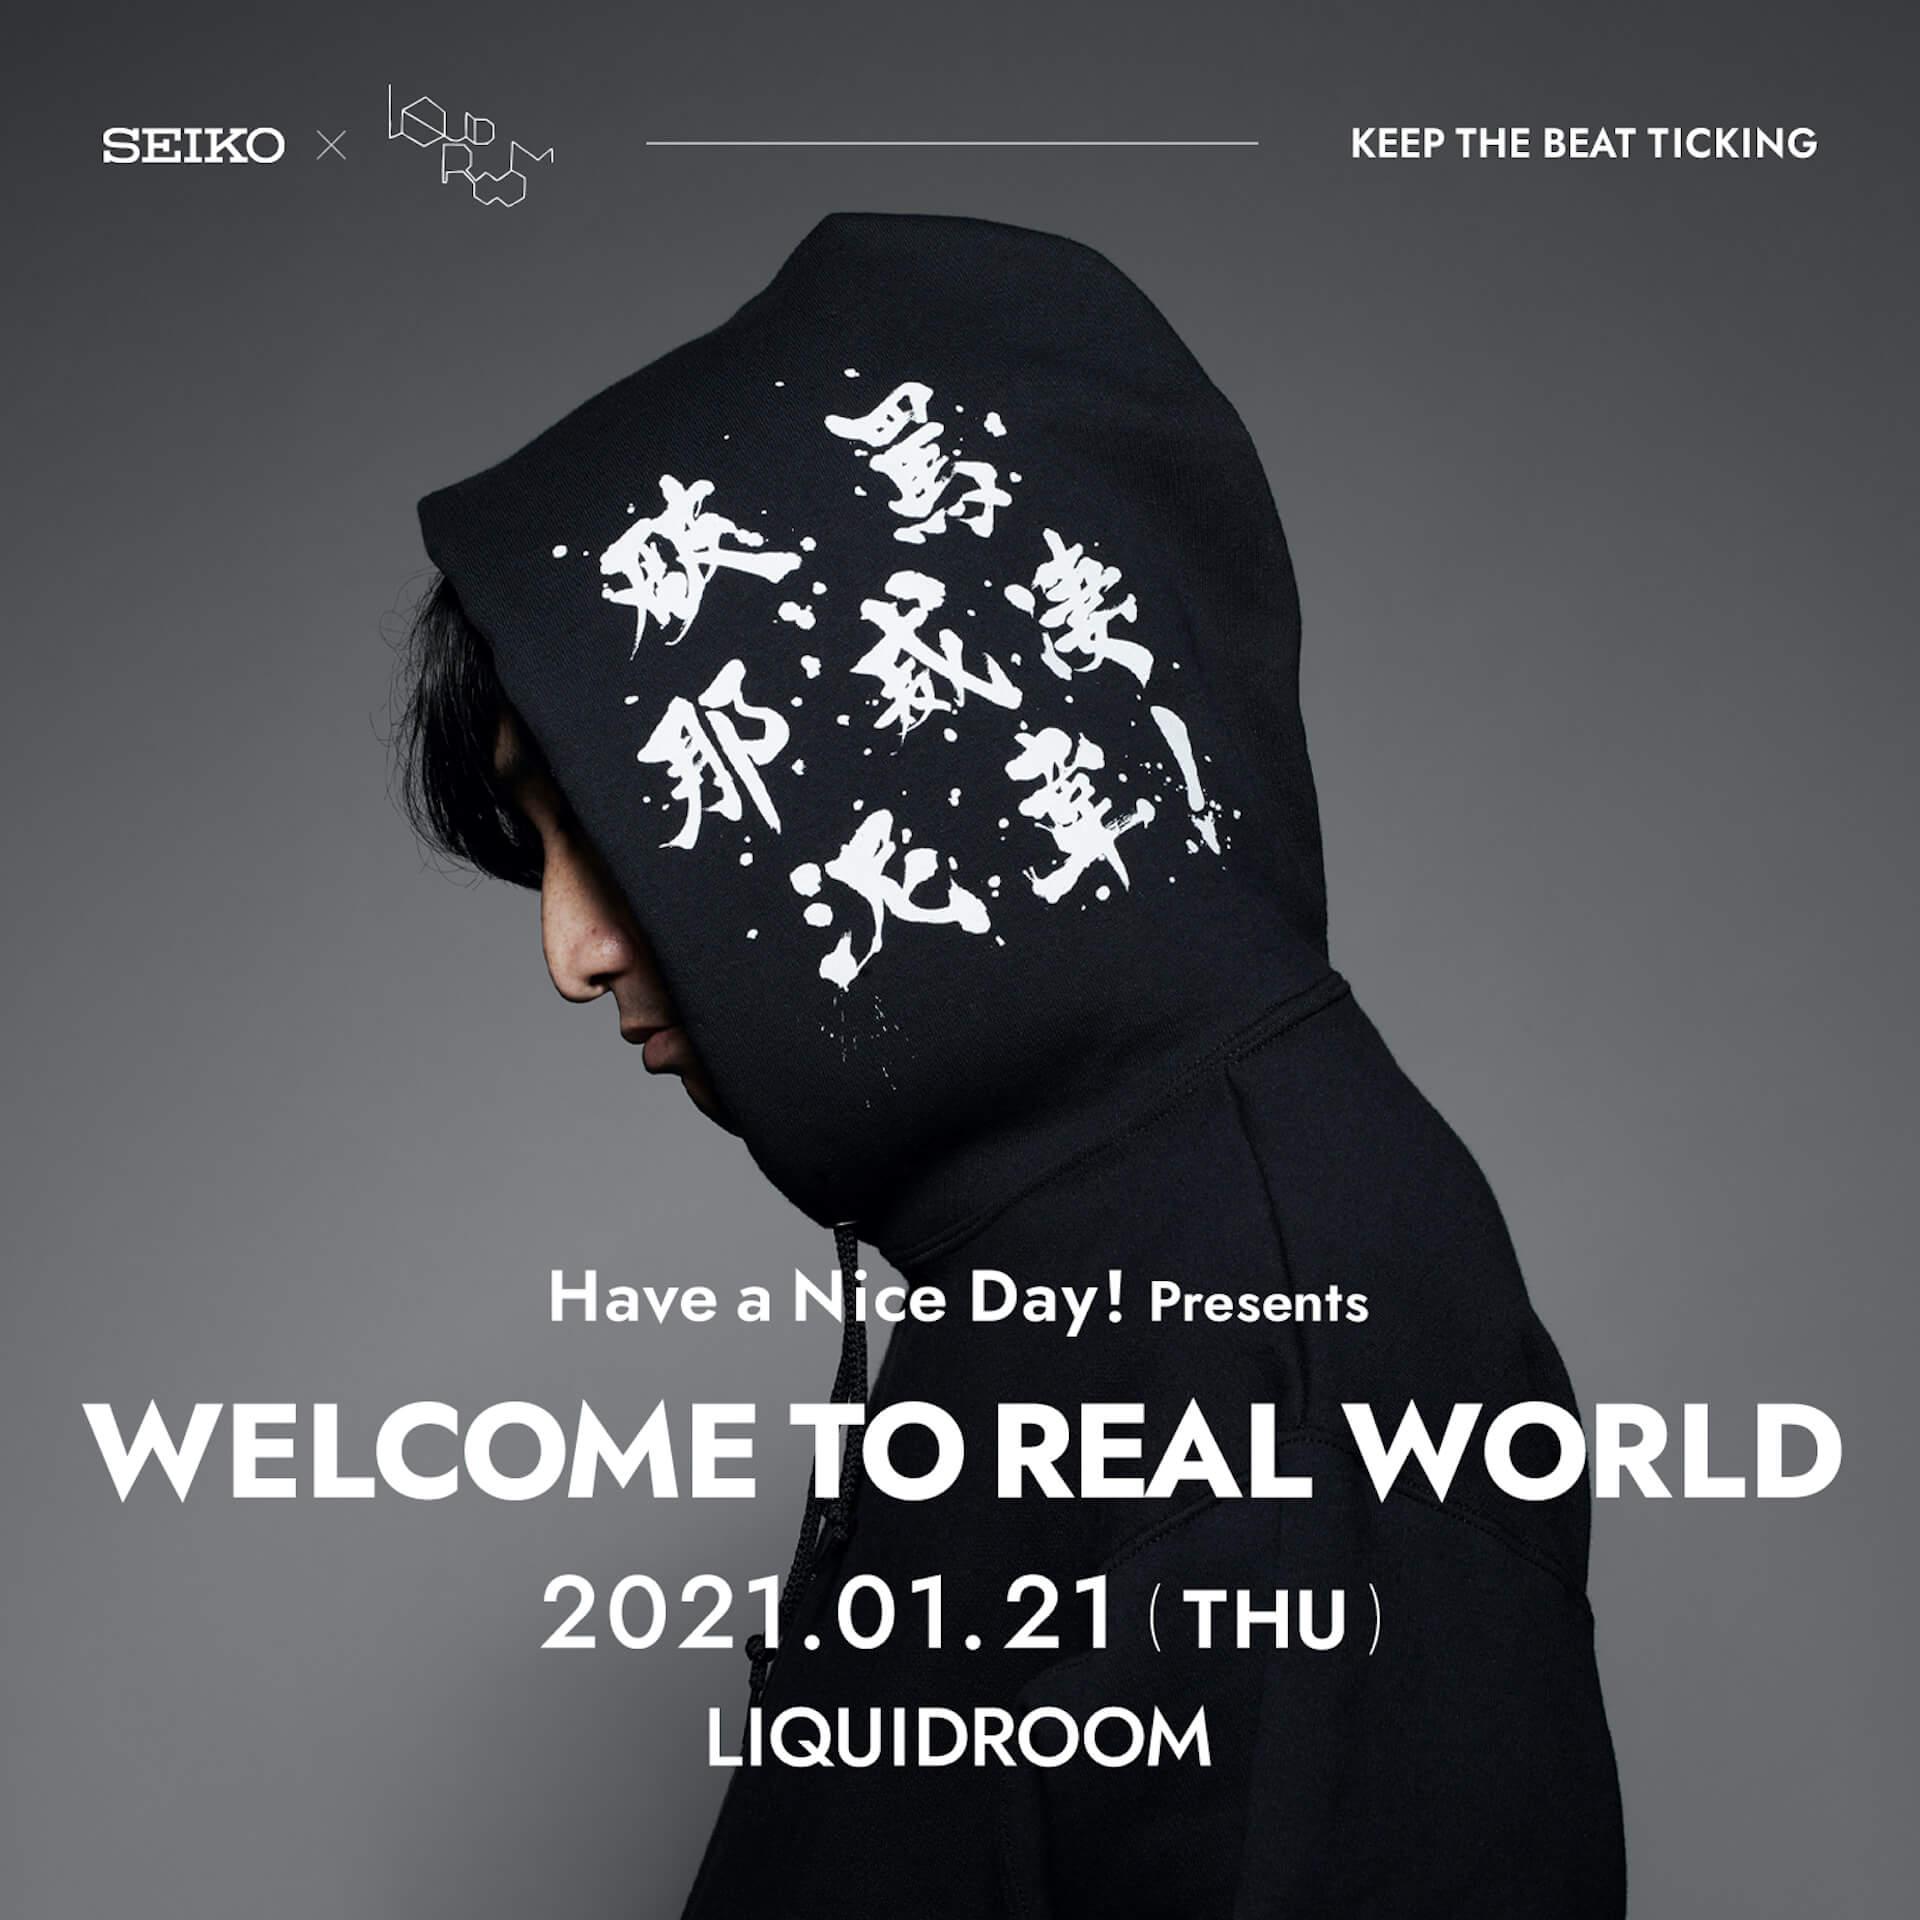 Keep The Beat Ticking「音楽の針を止めない」| Seiko × LIQUIDROOMのコラボレーションが決定 music201211-KeepTheBeatTicking-5